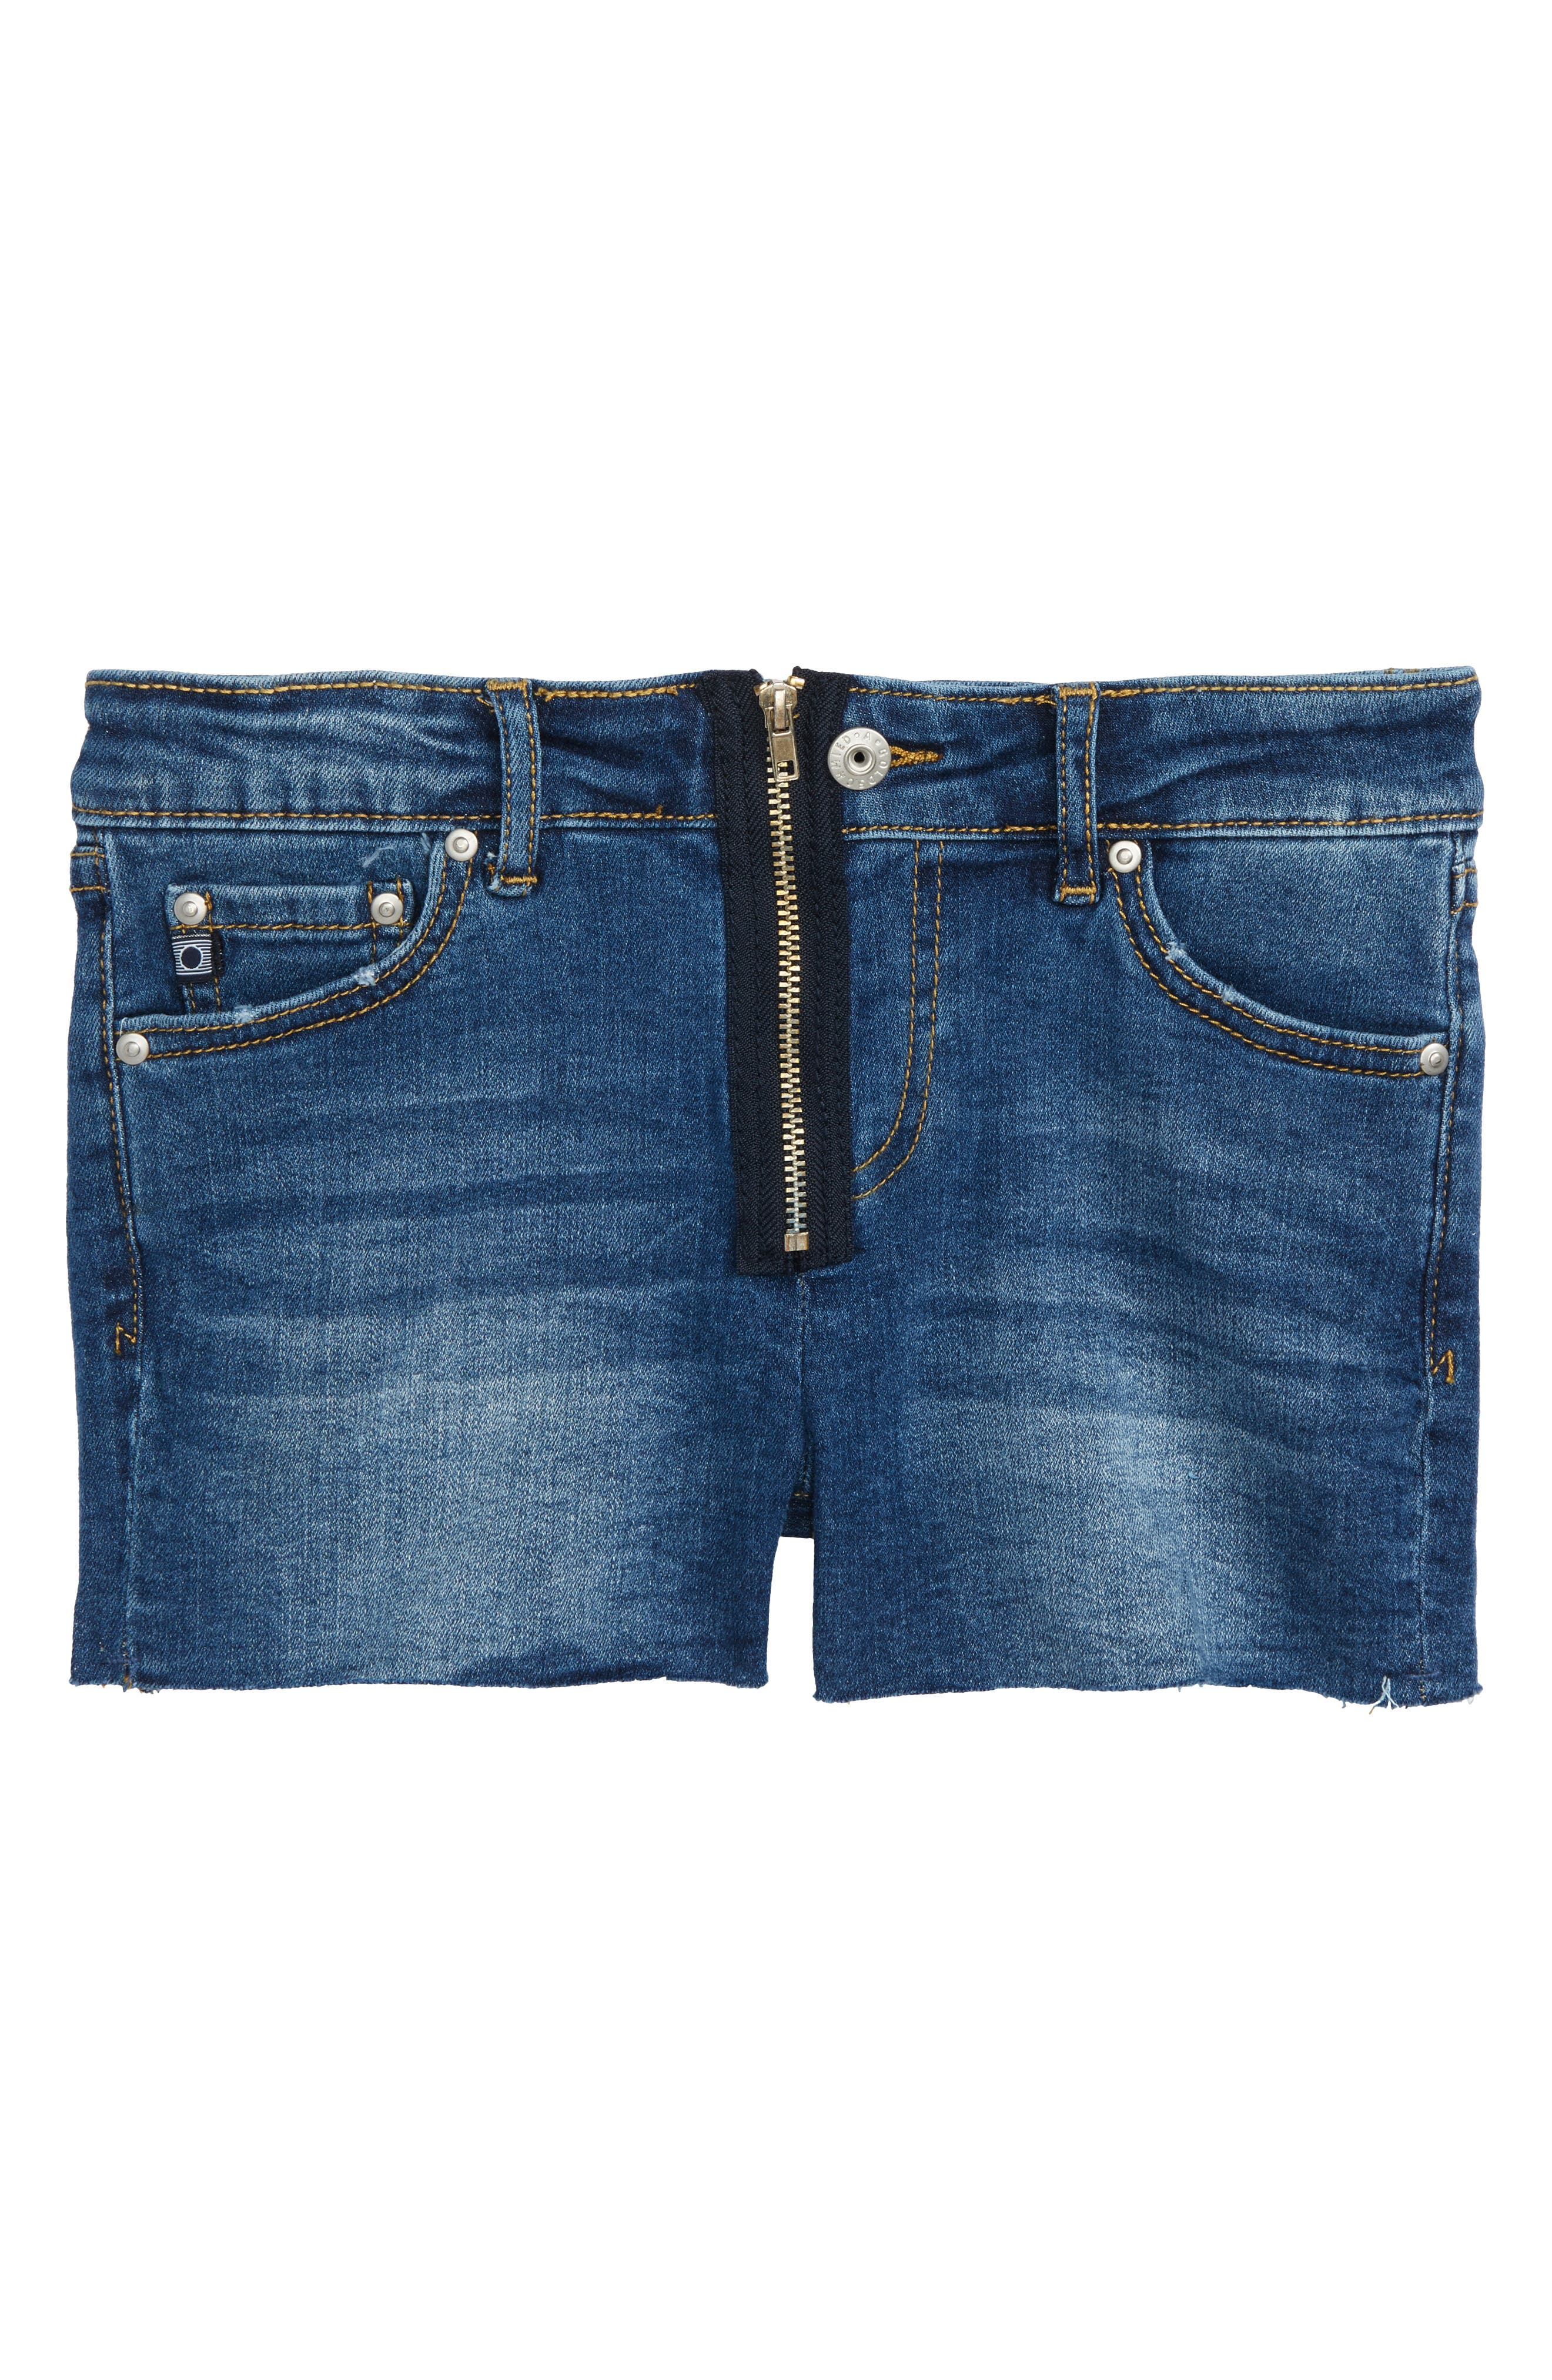 Main Image - ag adriano goldschmied kids The Bruna Cutoff Denim Shorts (Big Girls)